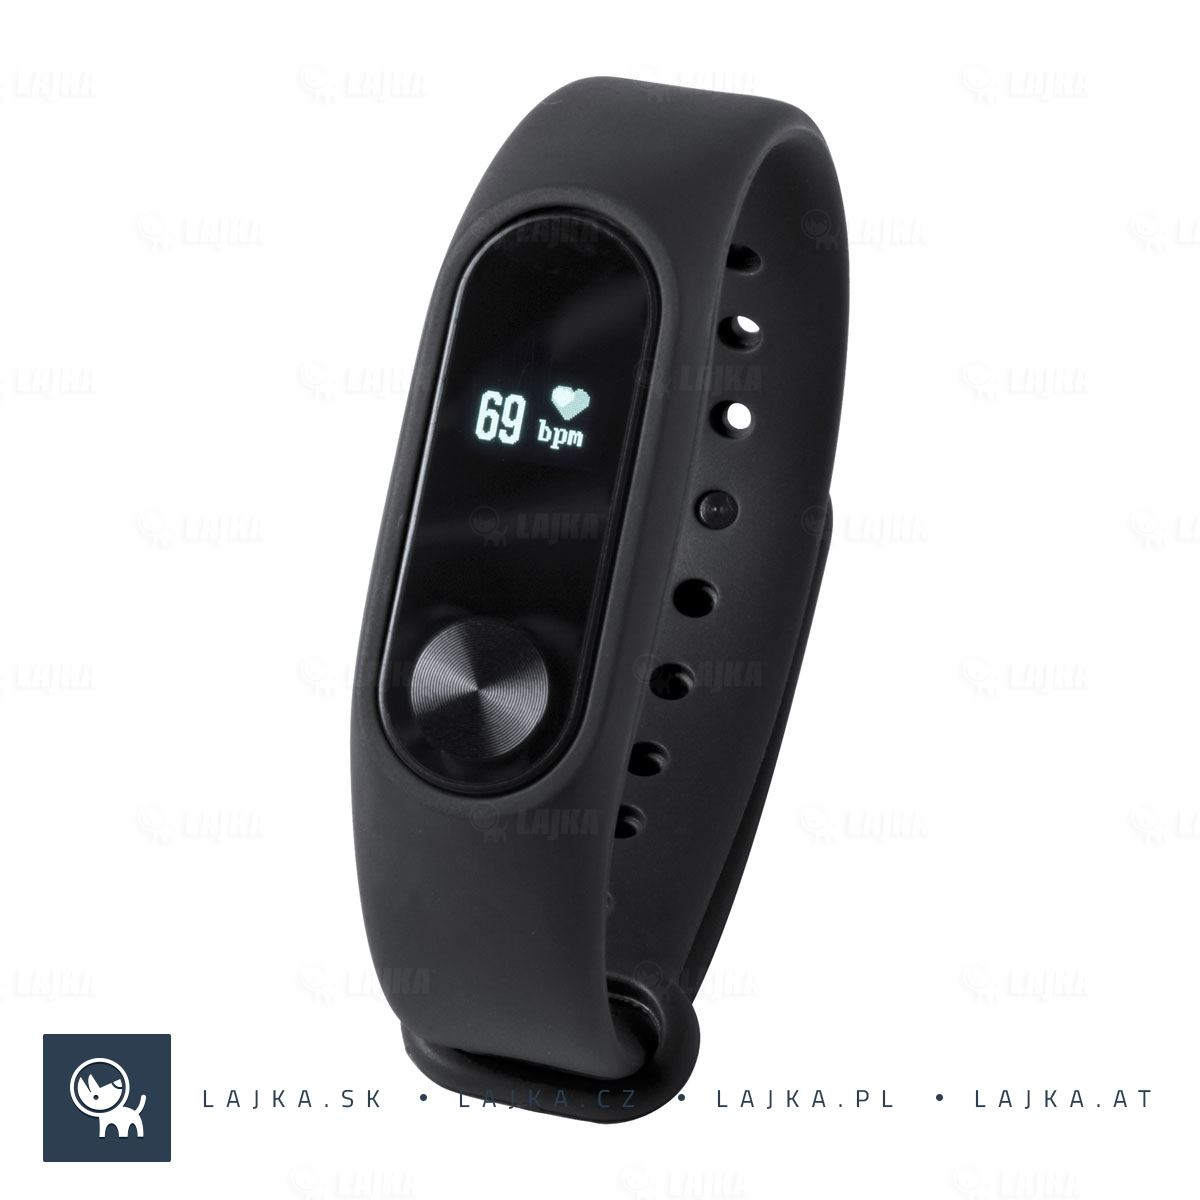 Smart hodinky Beytel 900c5d4c89b